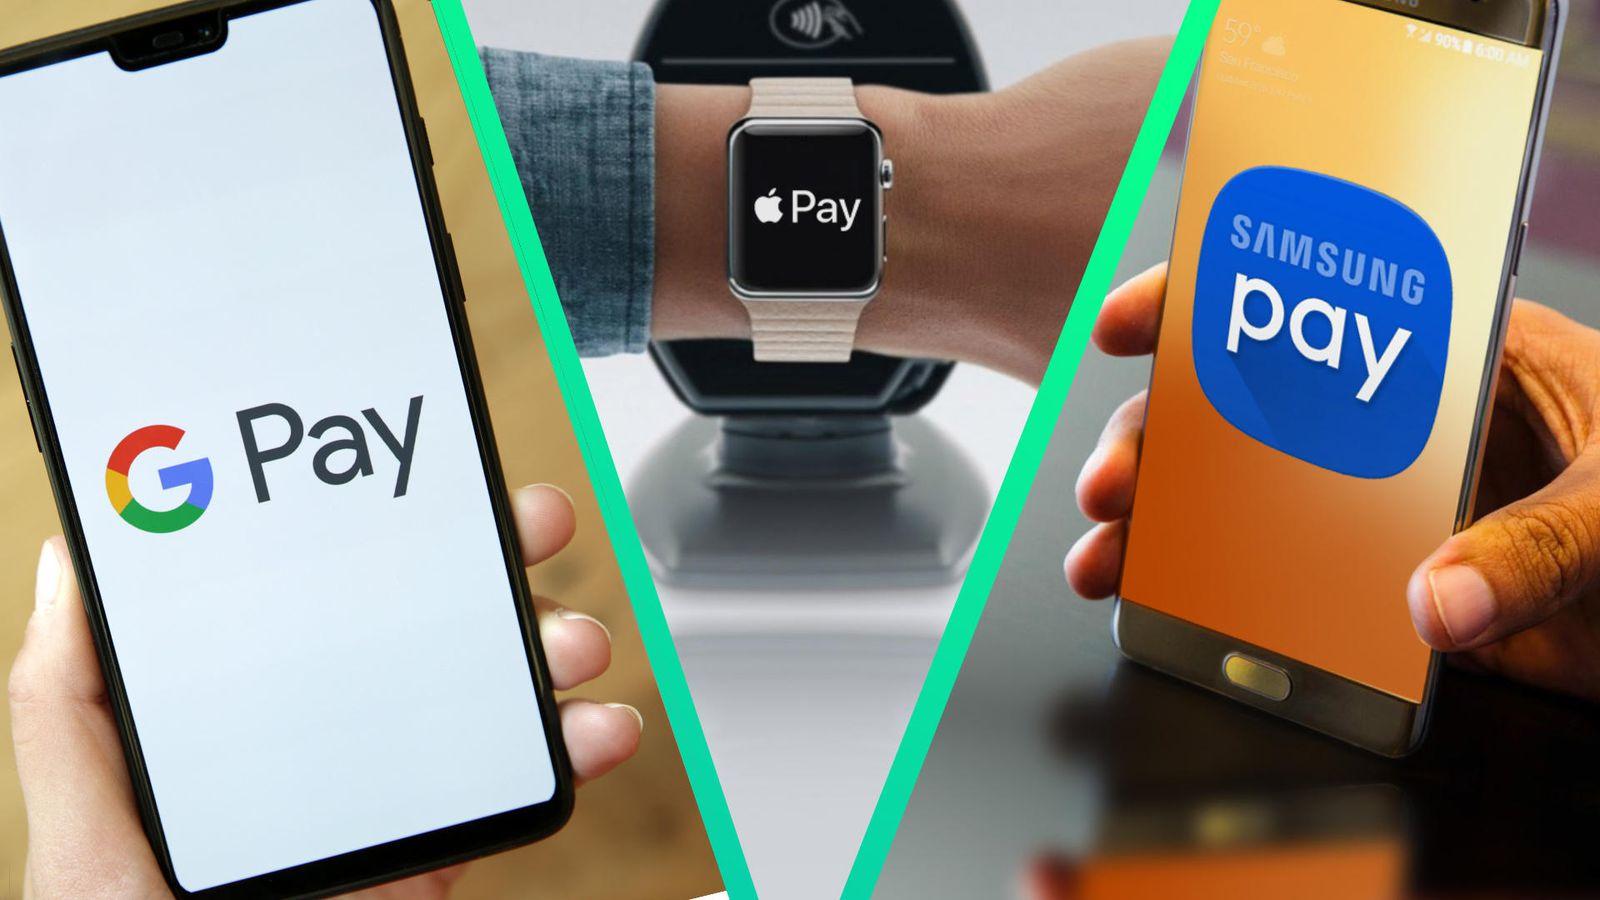 applepay-samsung-pay-googlepay-2